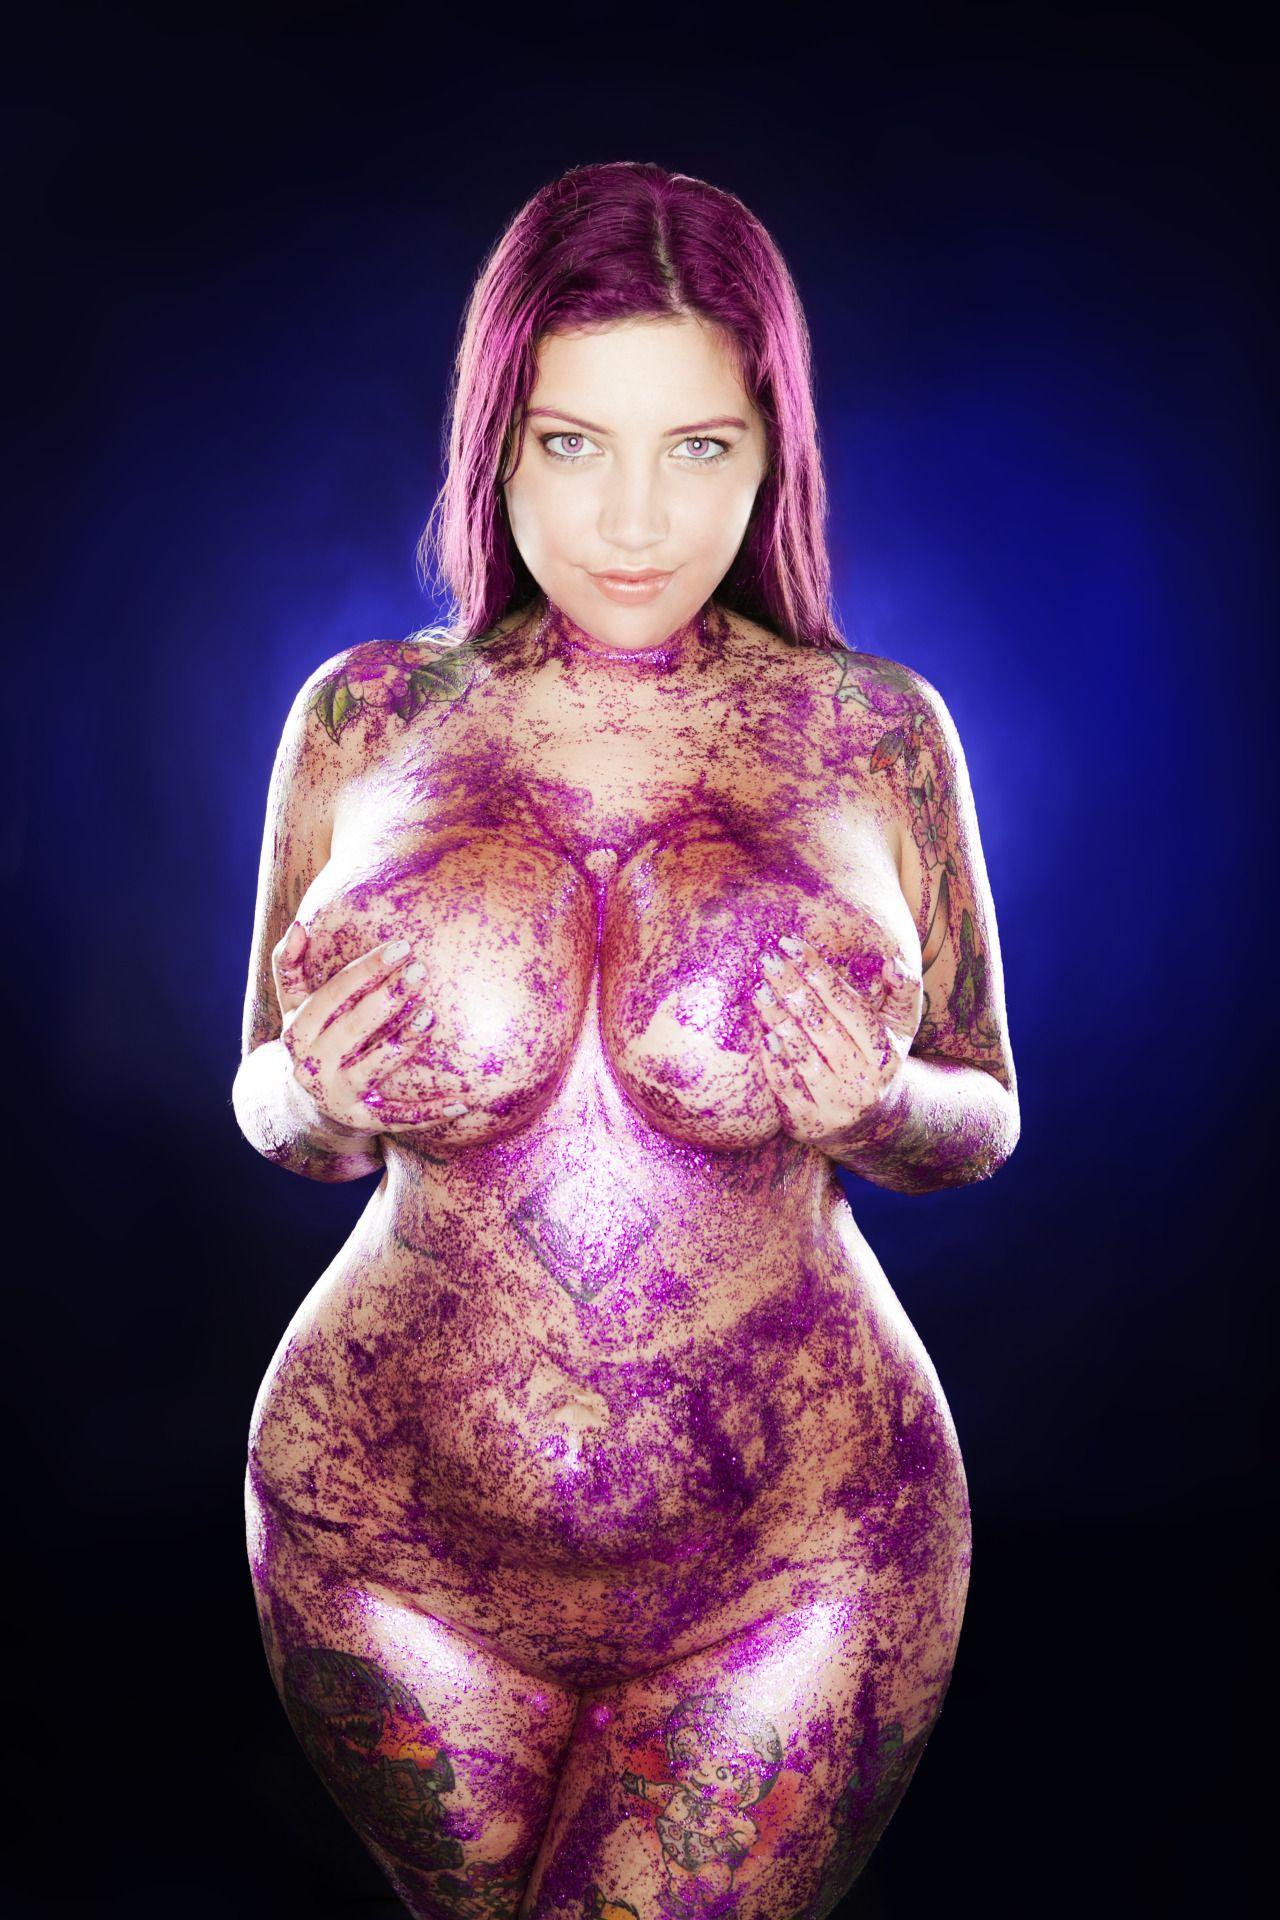 big boob at work